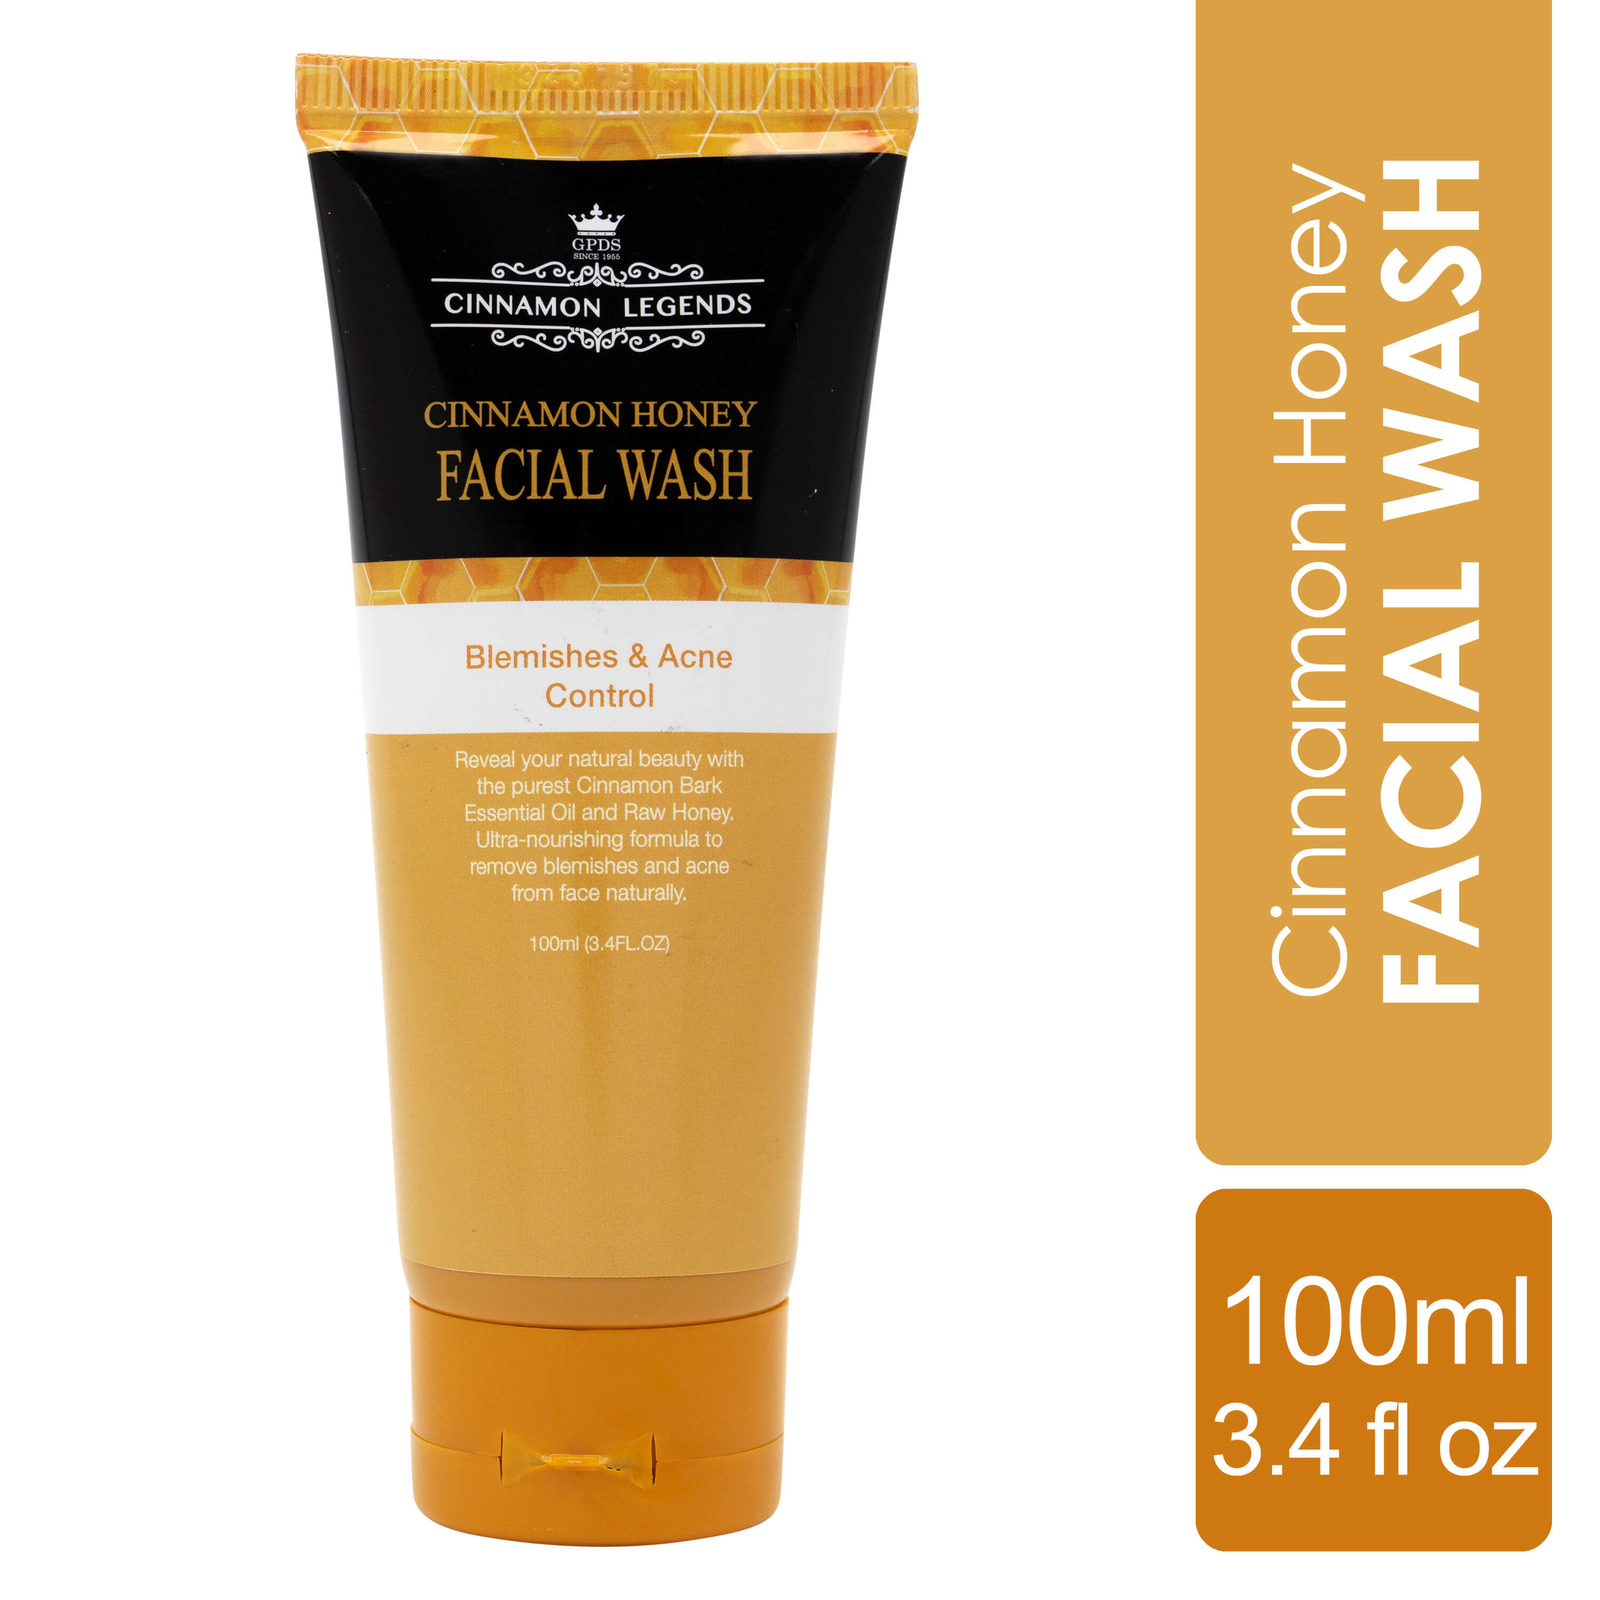 Cinnamon Legends Honey Facial wash 100 ml / 3.4 fl oz